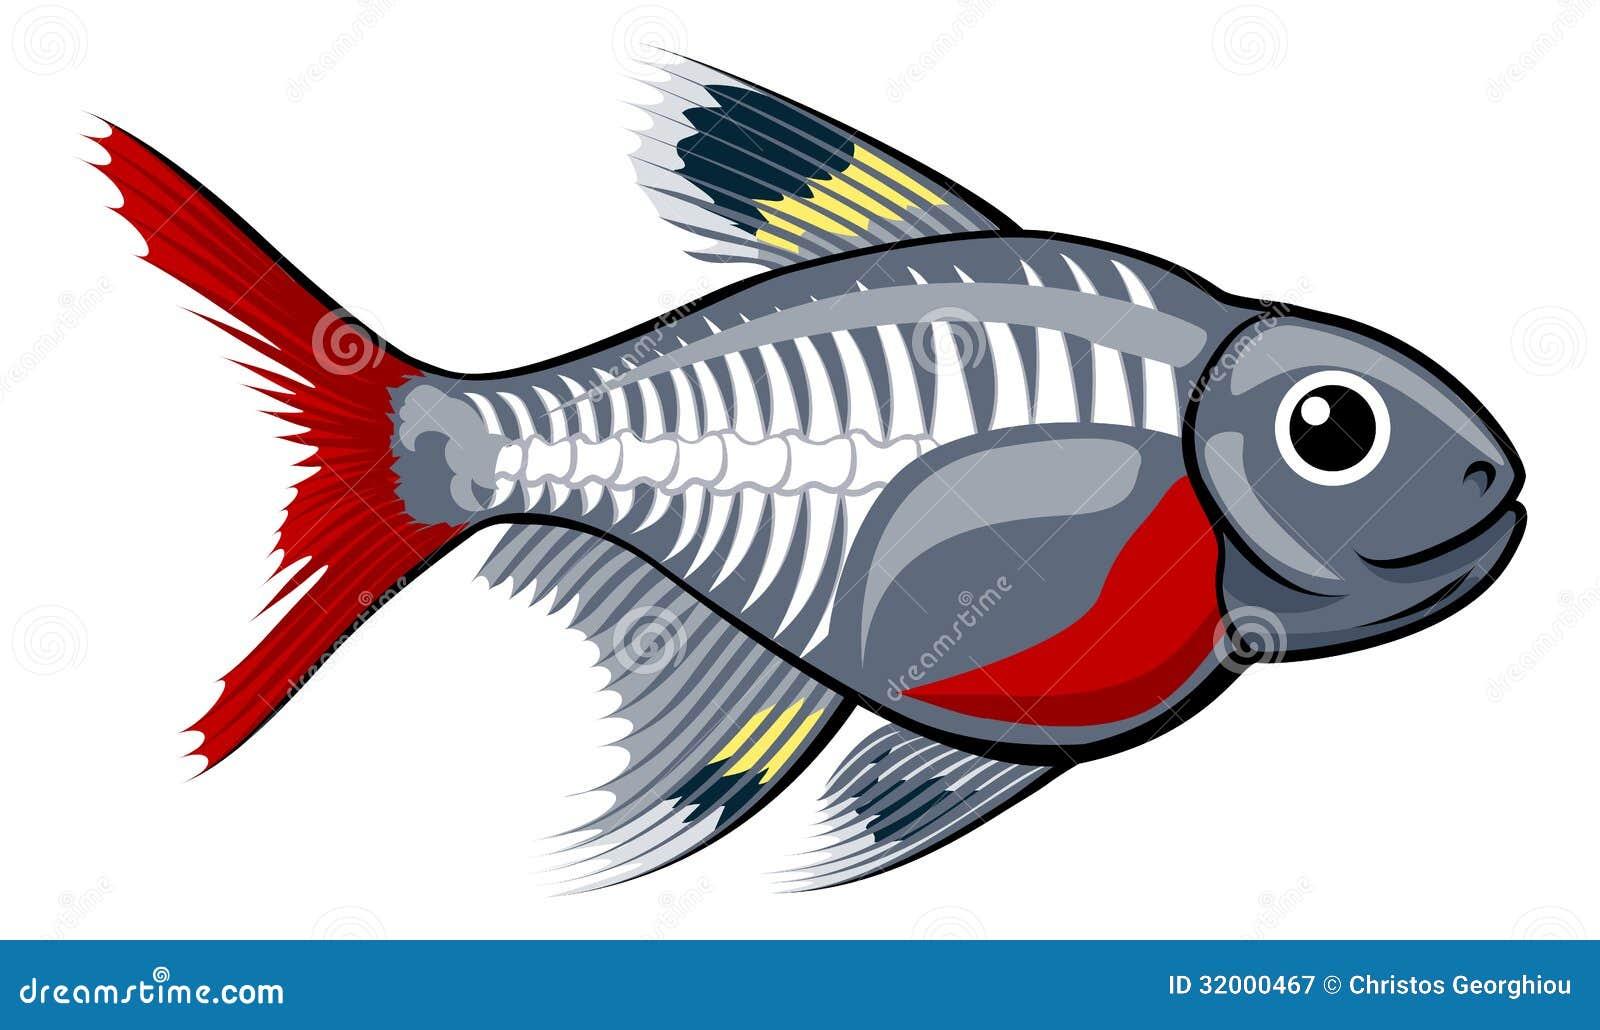 X-Ray Fish Clipart | Chadholtz